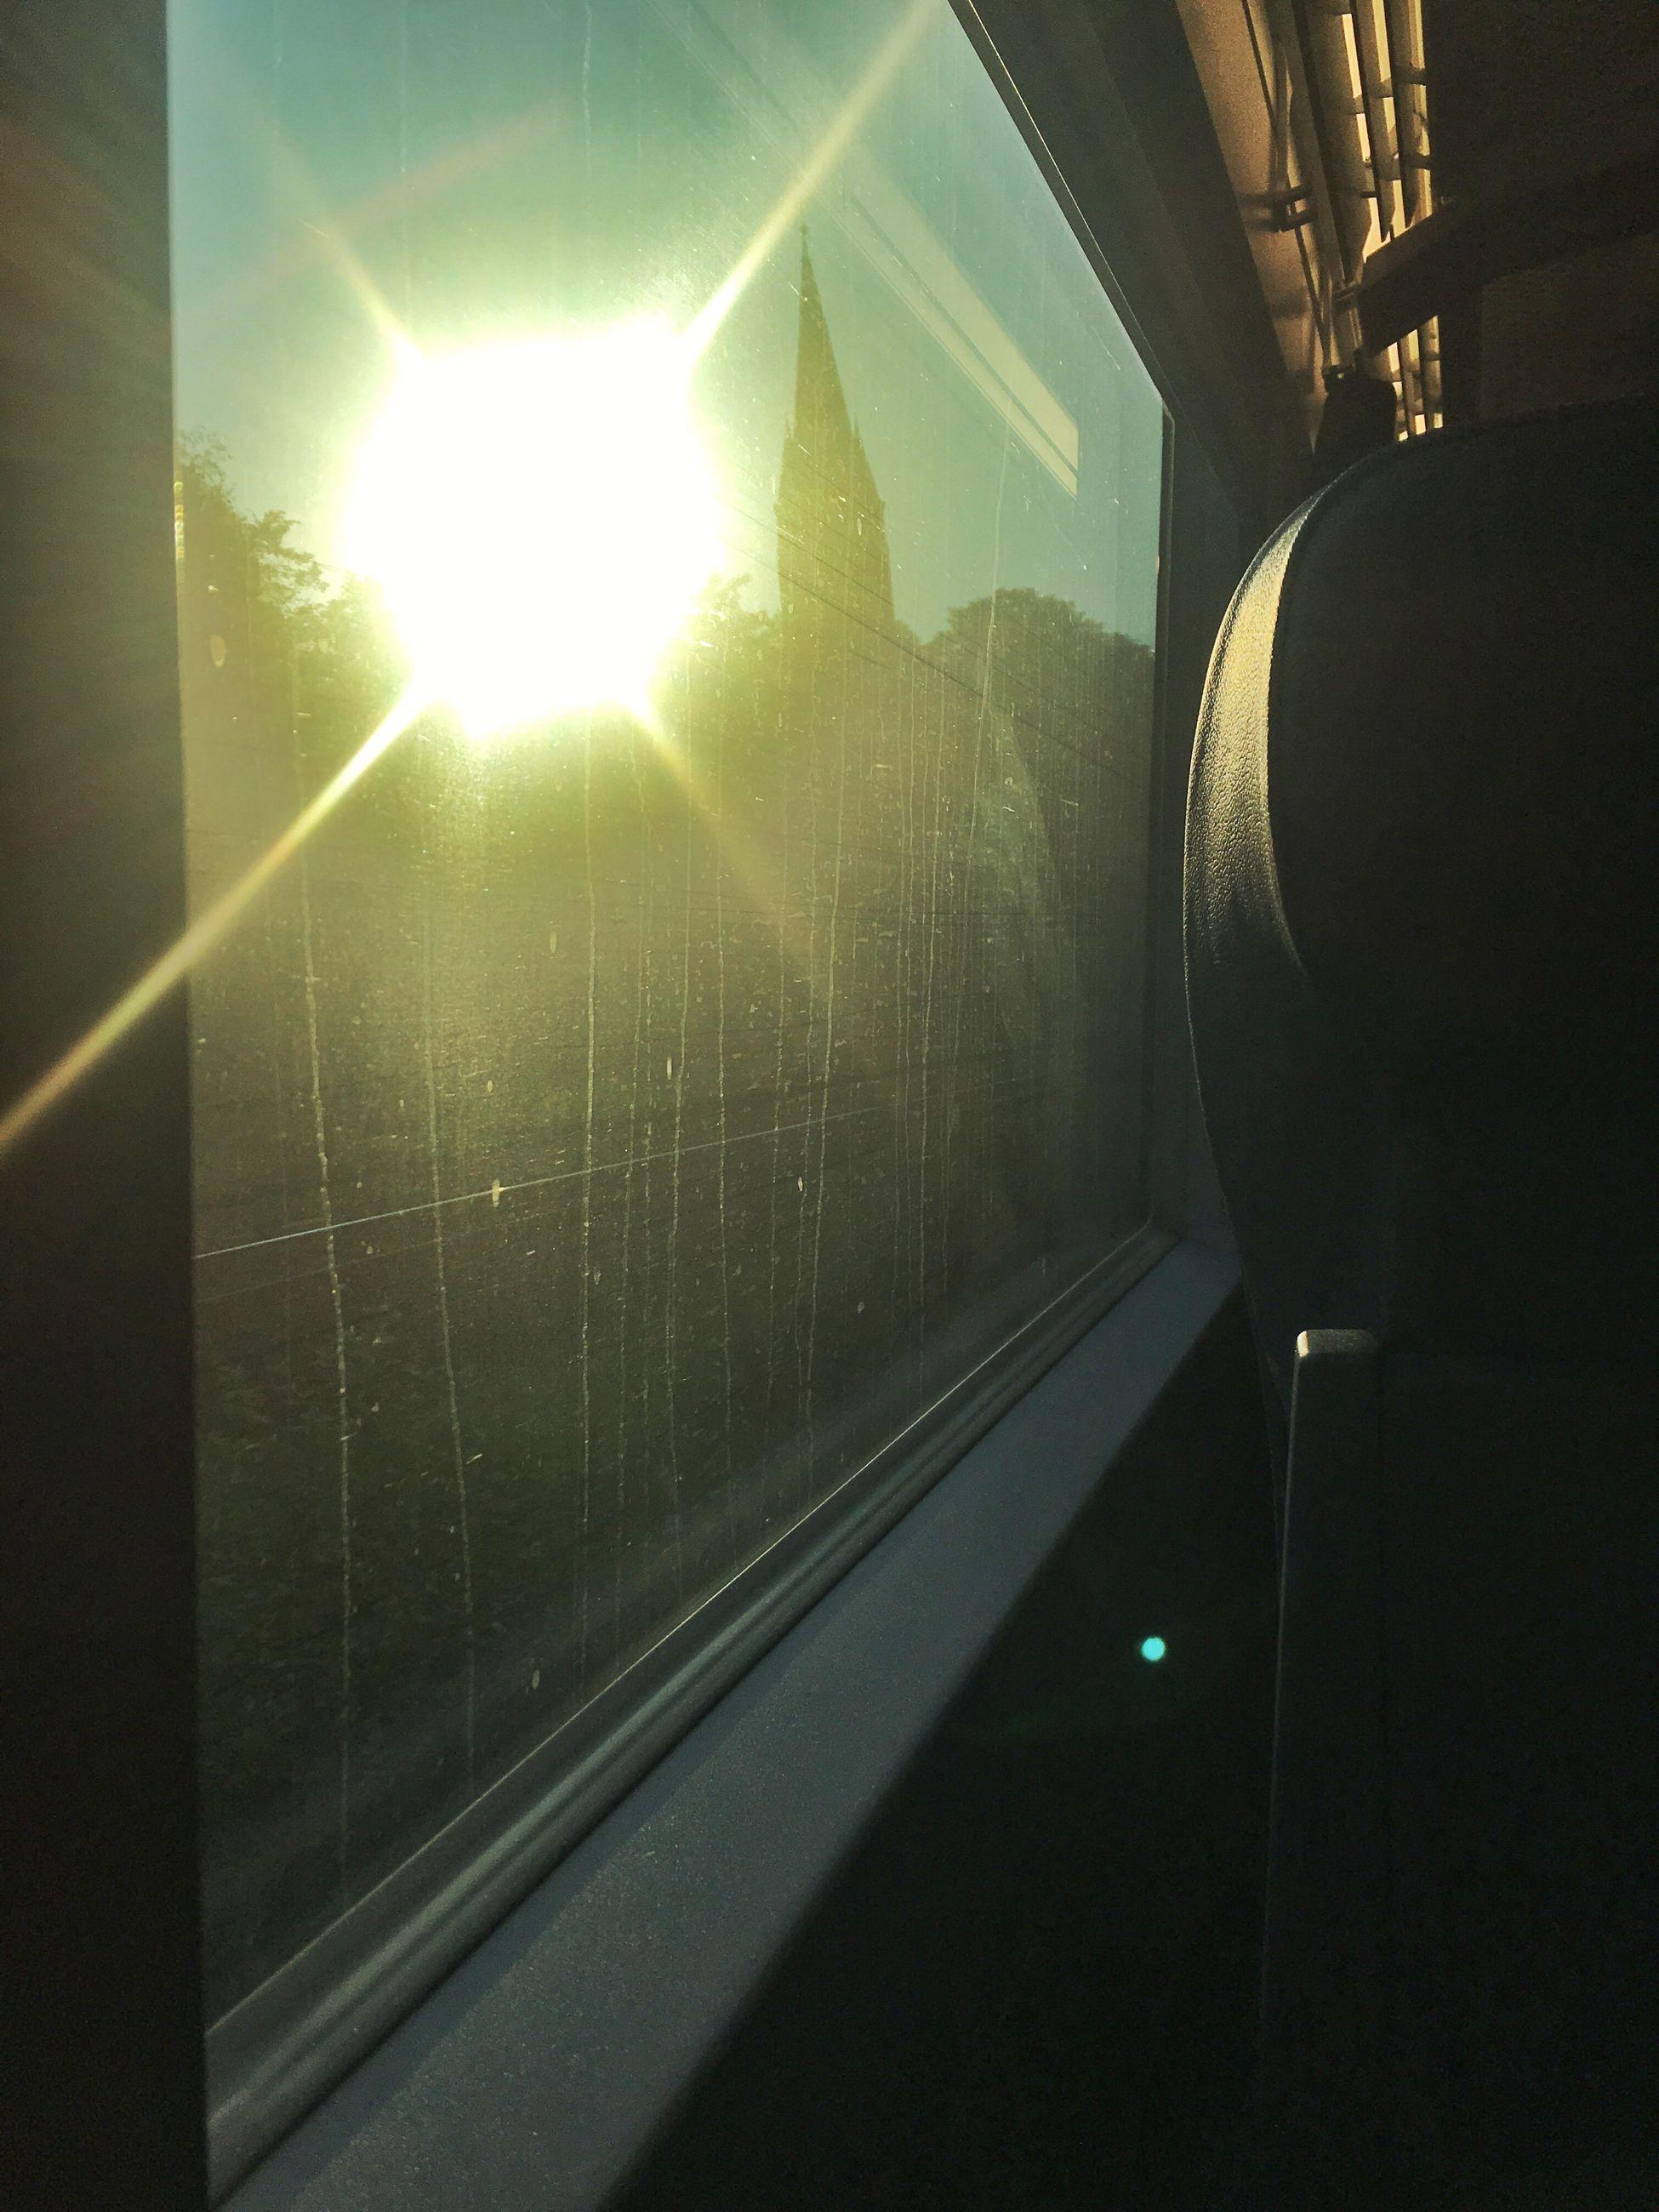 transportation, window, public transportation, railroad track, indoors, illuminated, railroad station, mode of transport, railroad station platform, subway station, lens flare, sun, bright, journey, no people, public transport